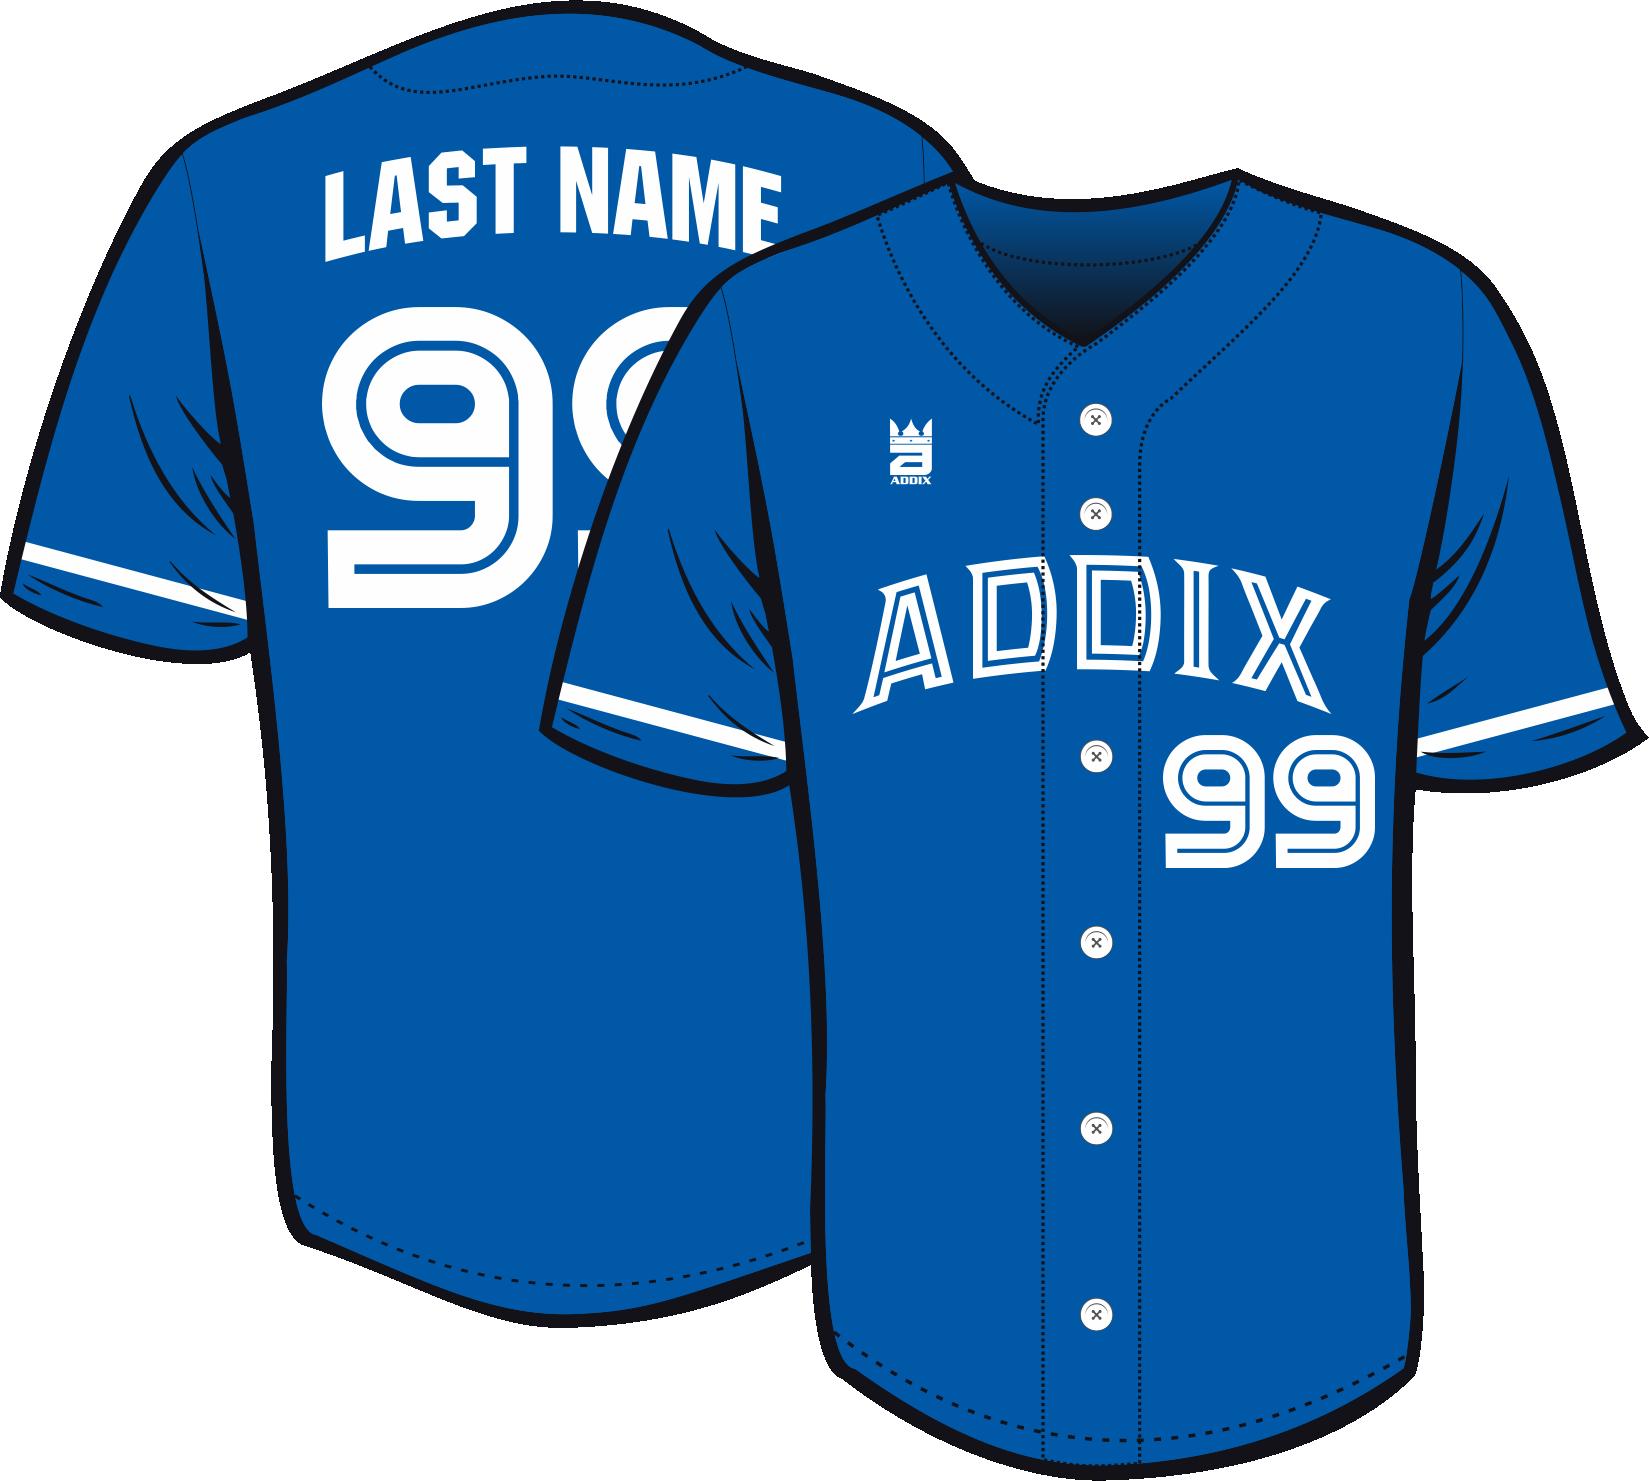 ADDIX Jays